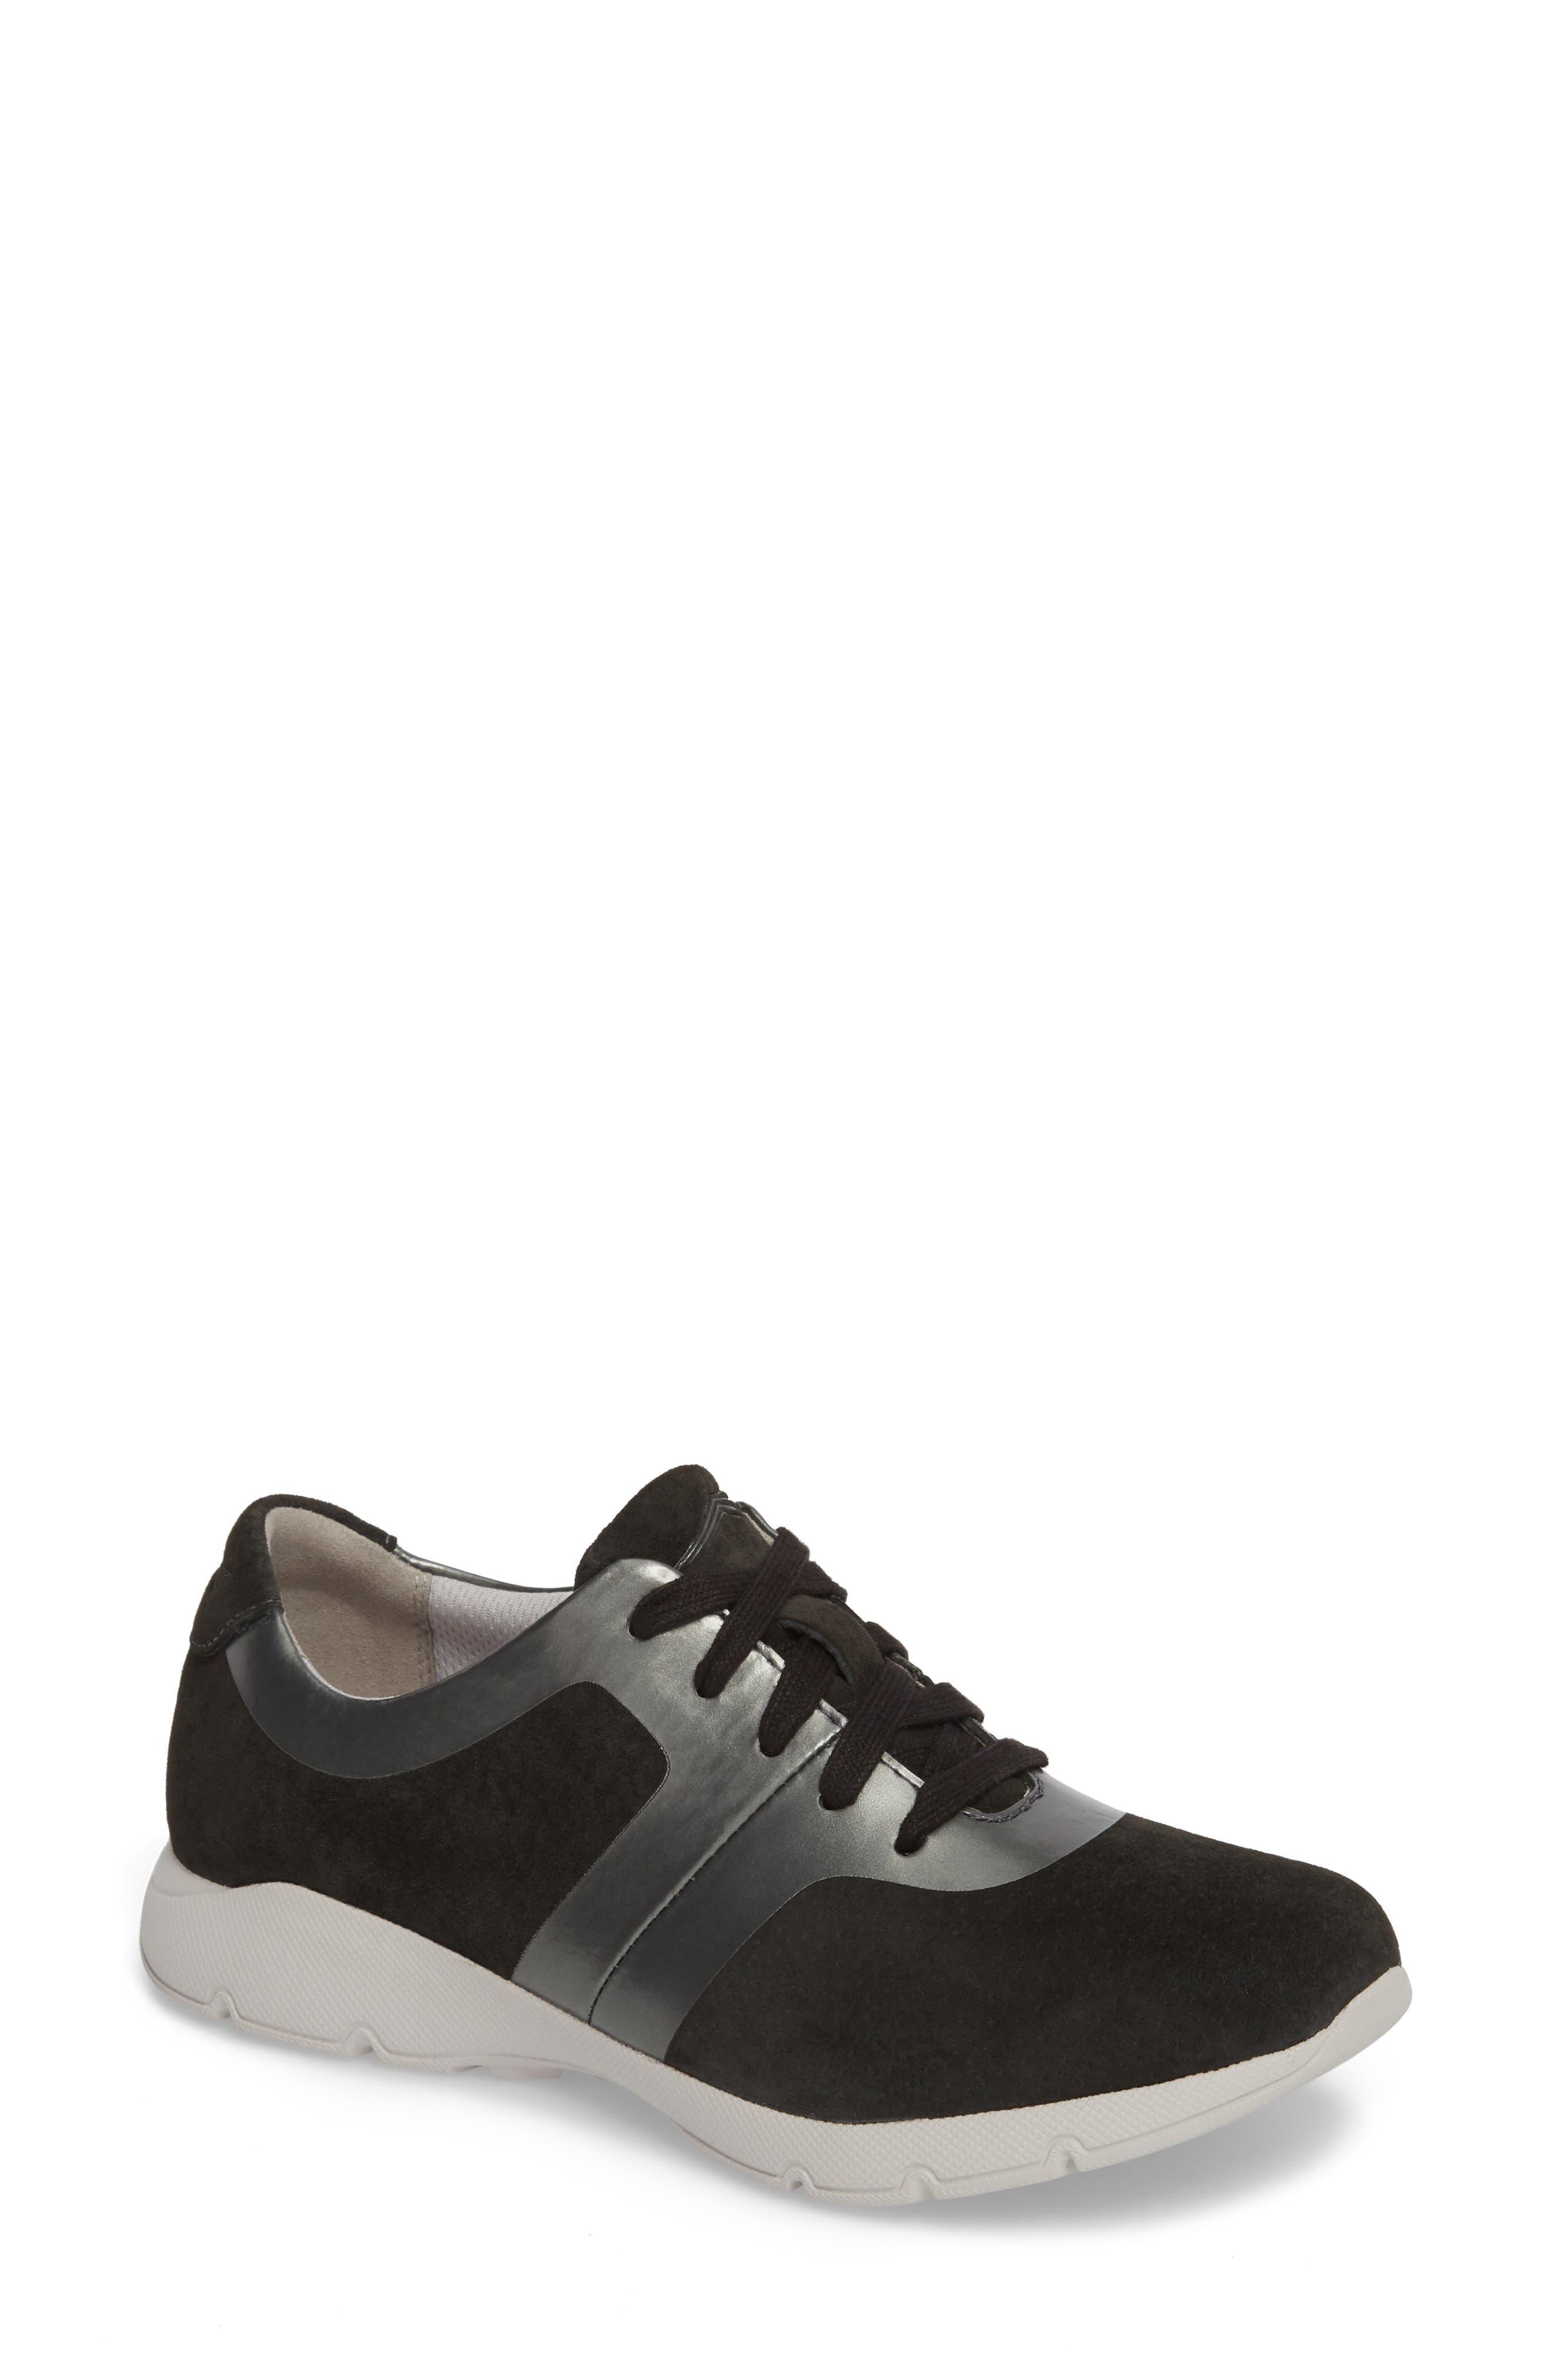 Andi Sneaker,                             Main thumbnail 1, color,